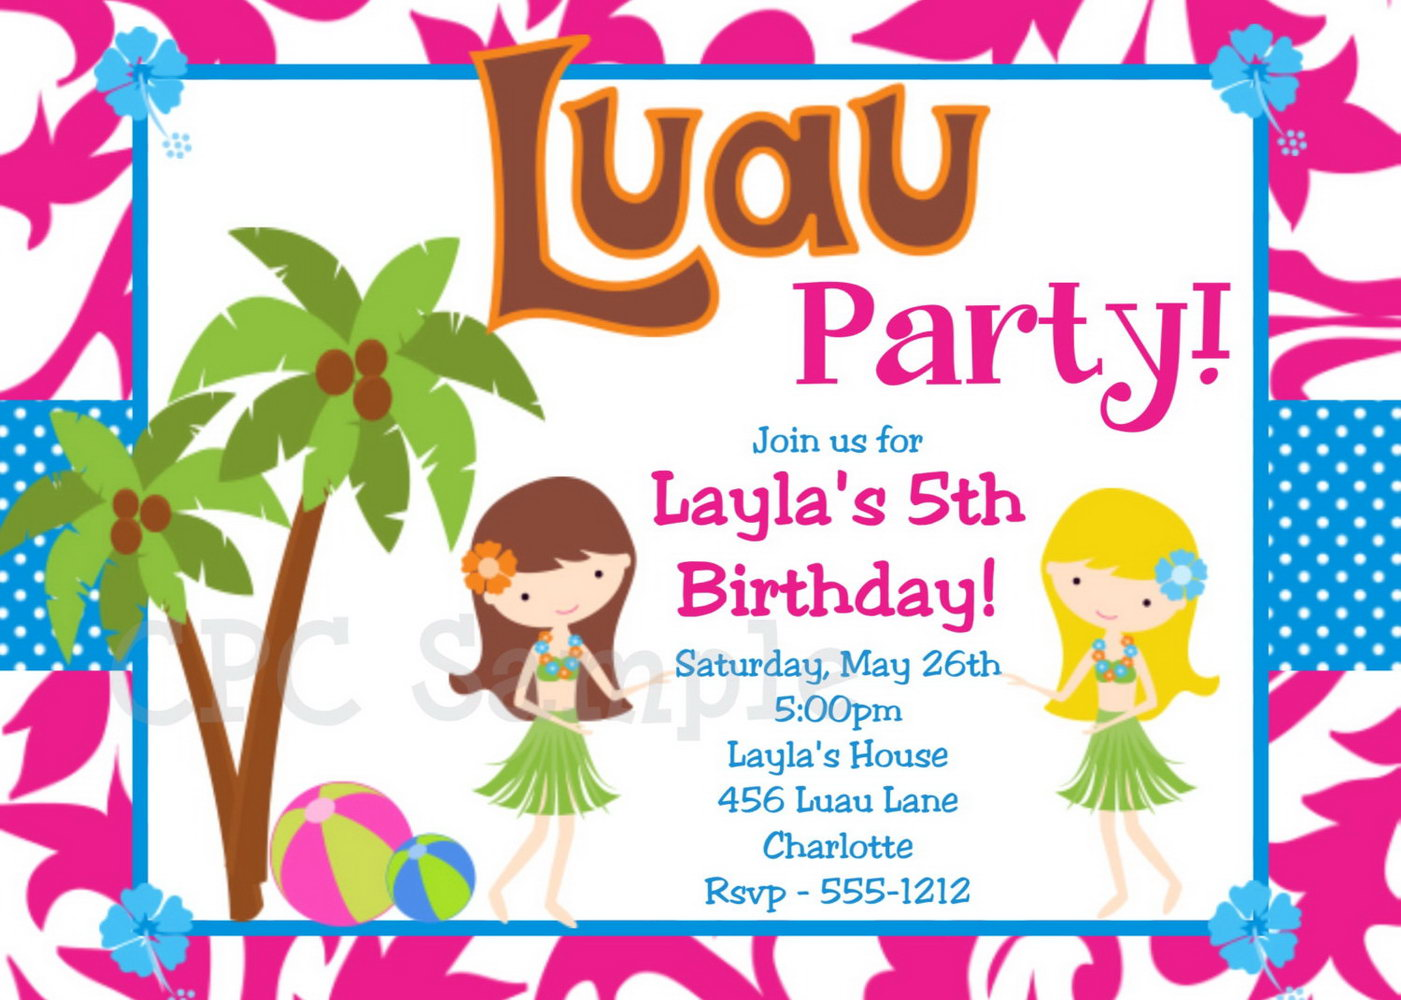 Luau Party Invitation Template Free